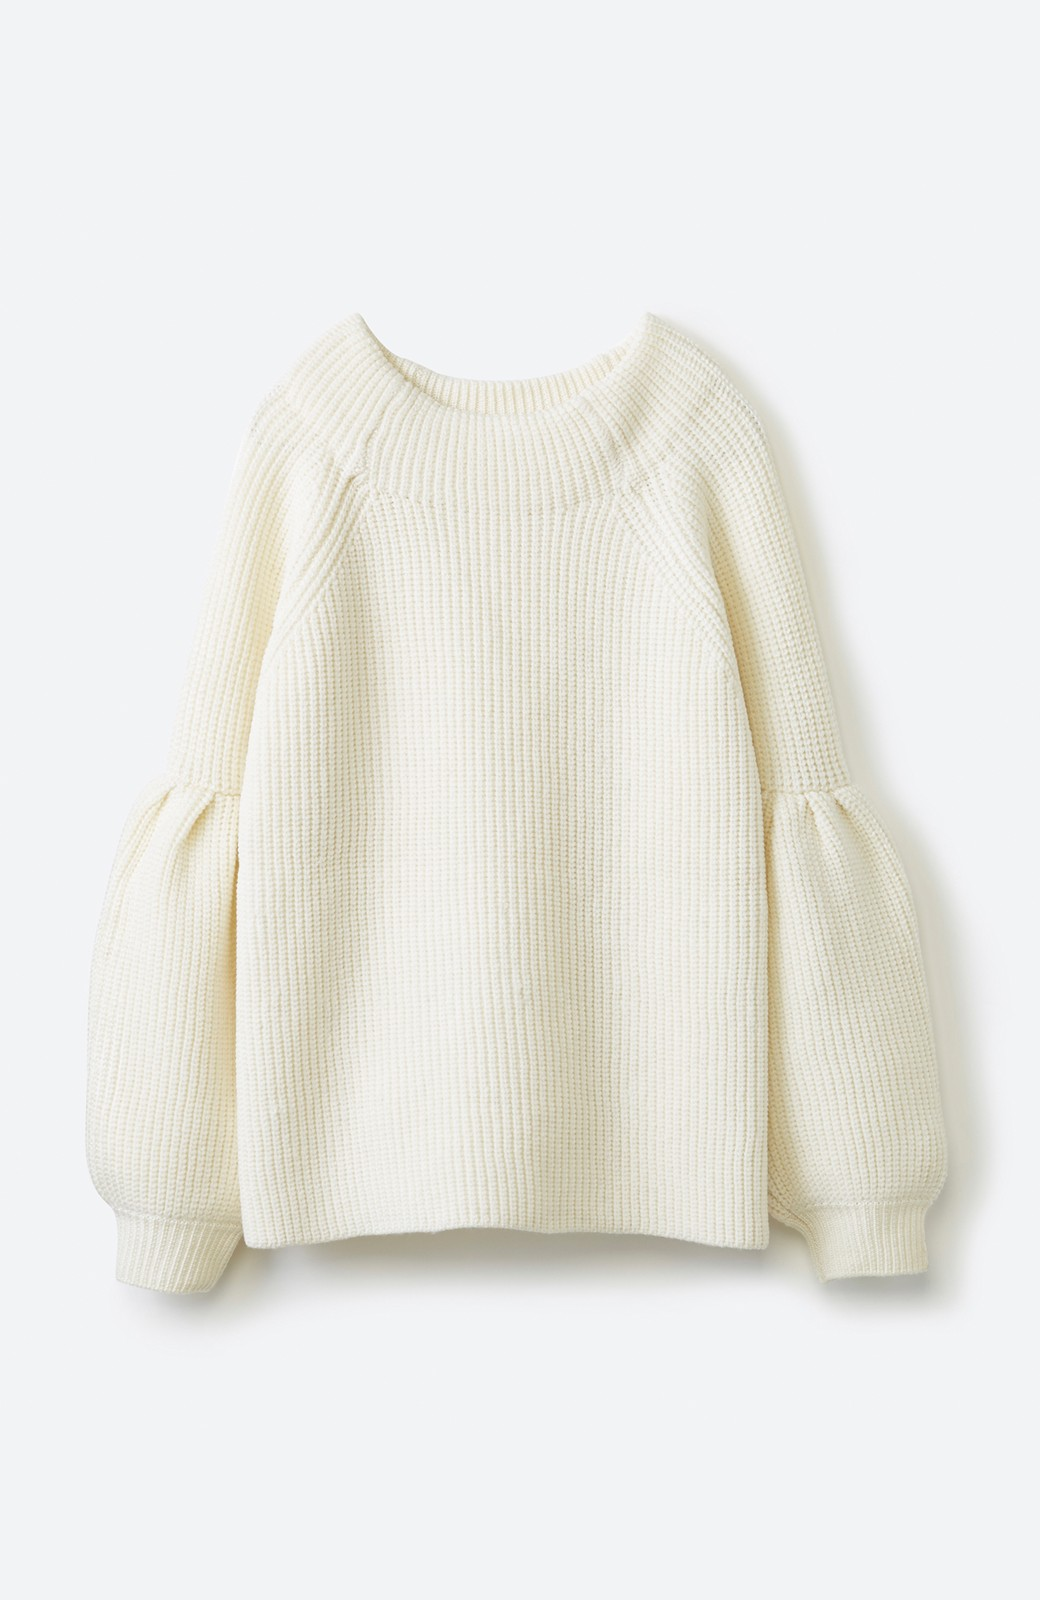 haco! 女子度があがる あぜ編みふわスリーブニット <オフホワイト>の商品写真1